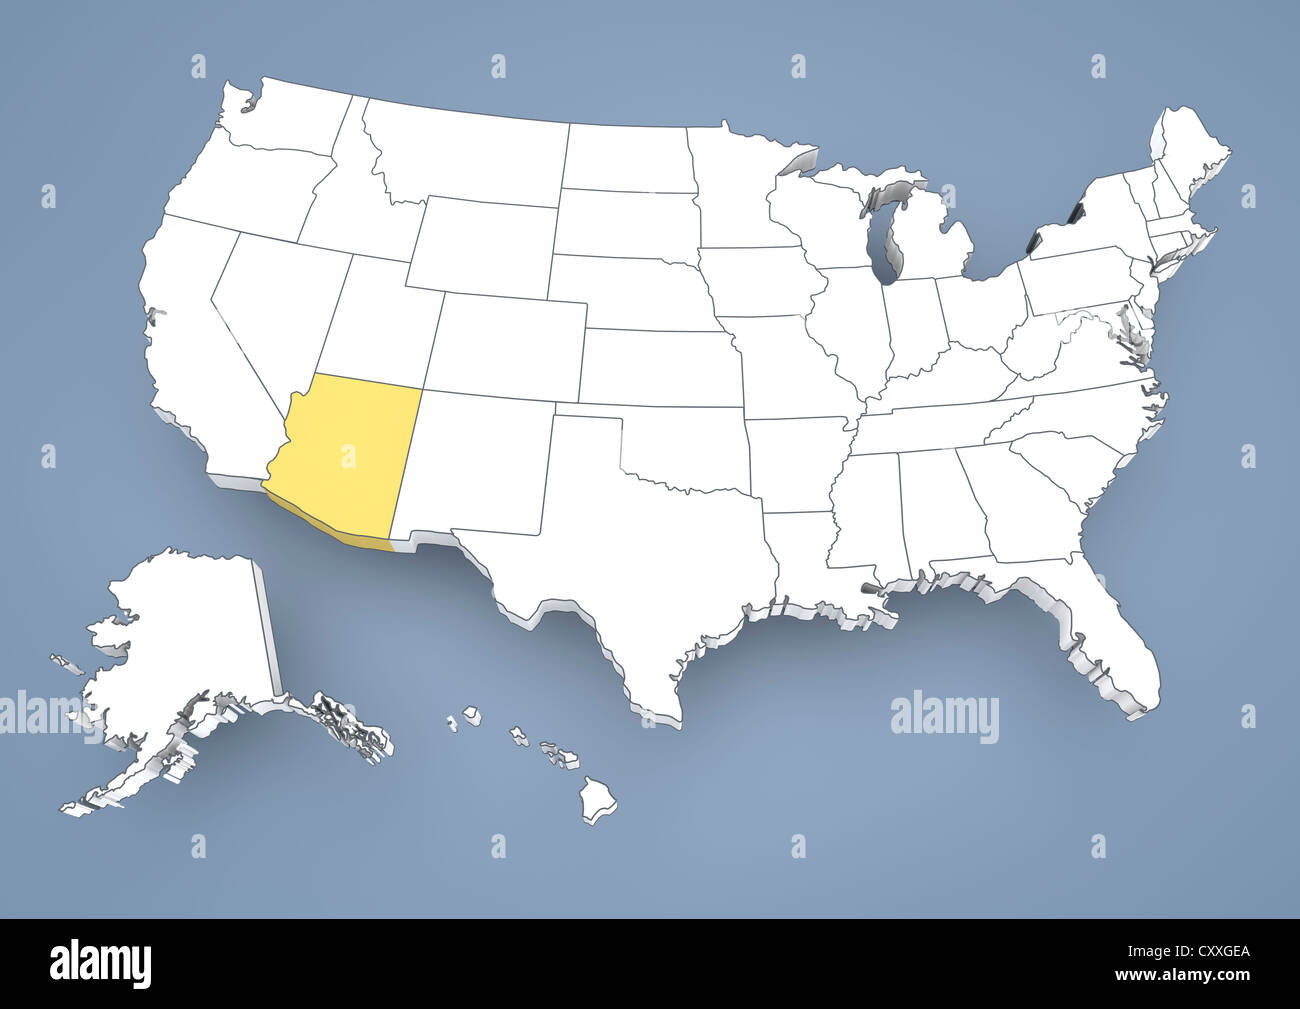 Arizona AZ Highlighted On A Contour Map Of USA United States Of - Arizona map usa